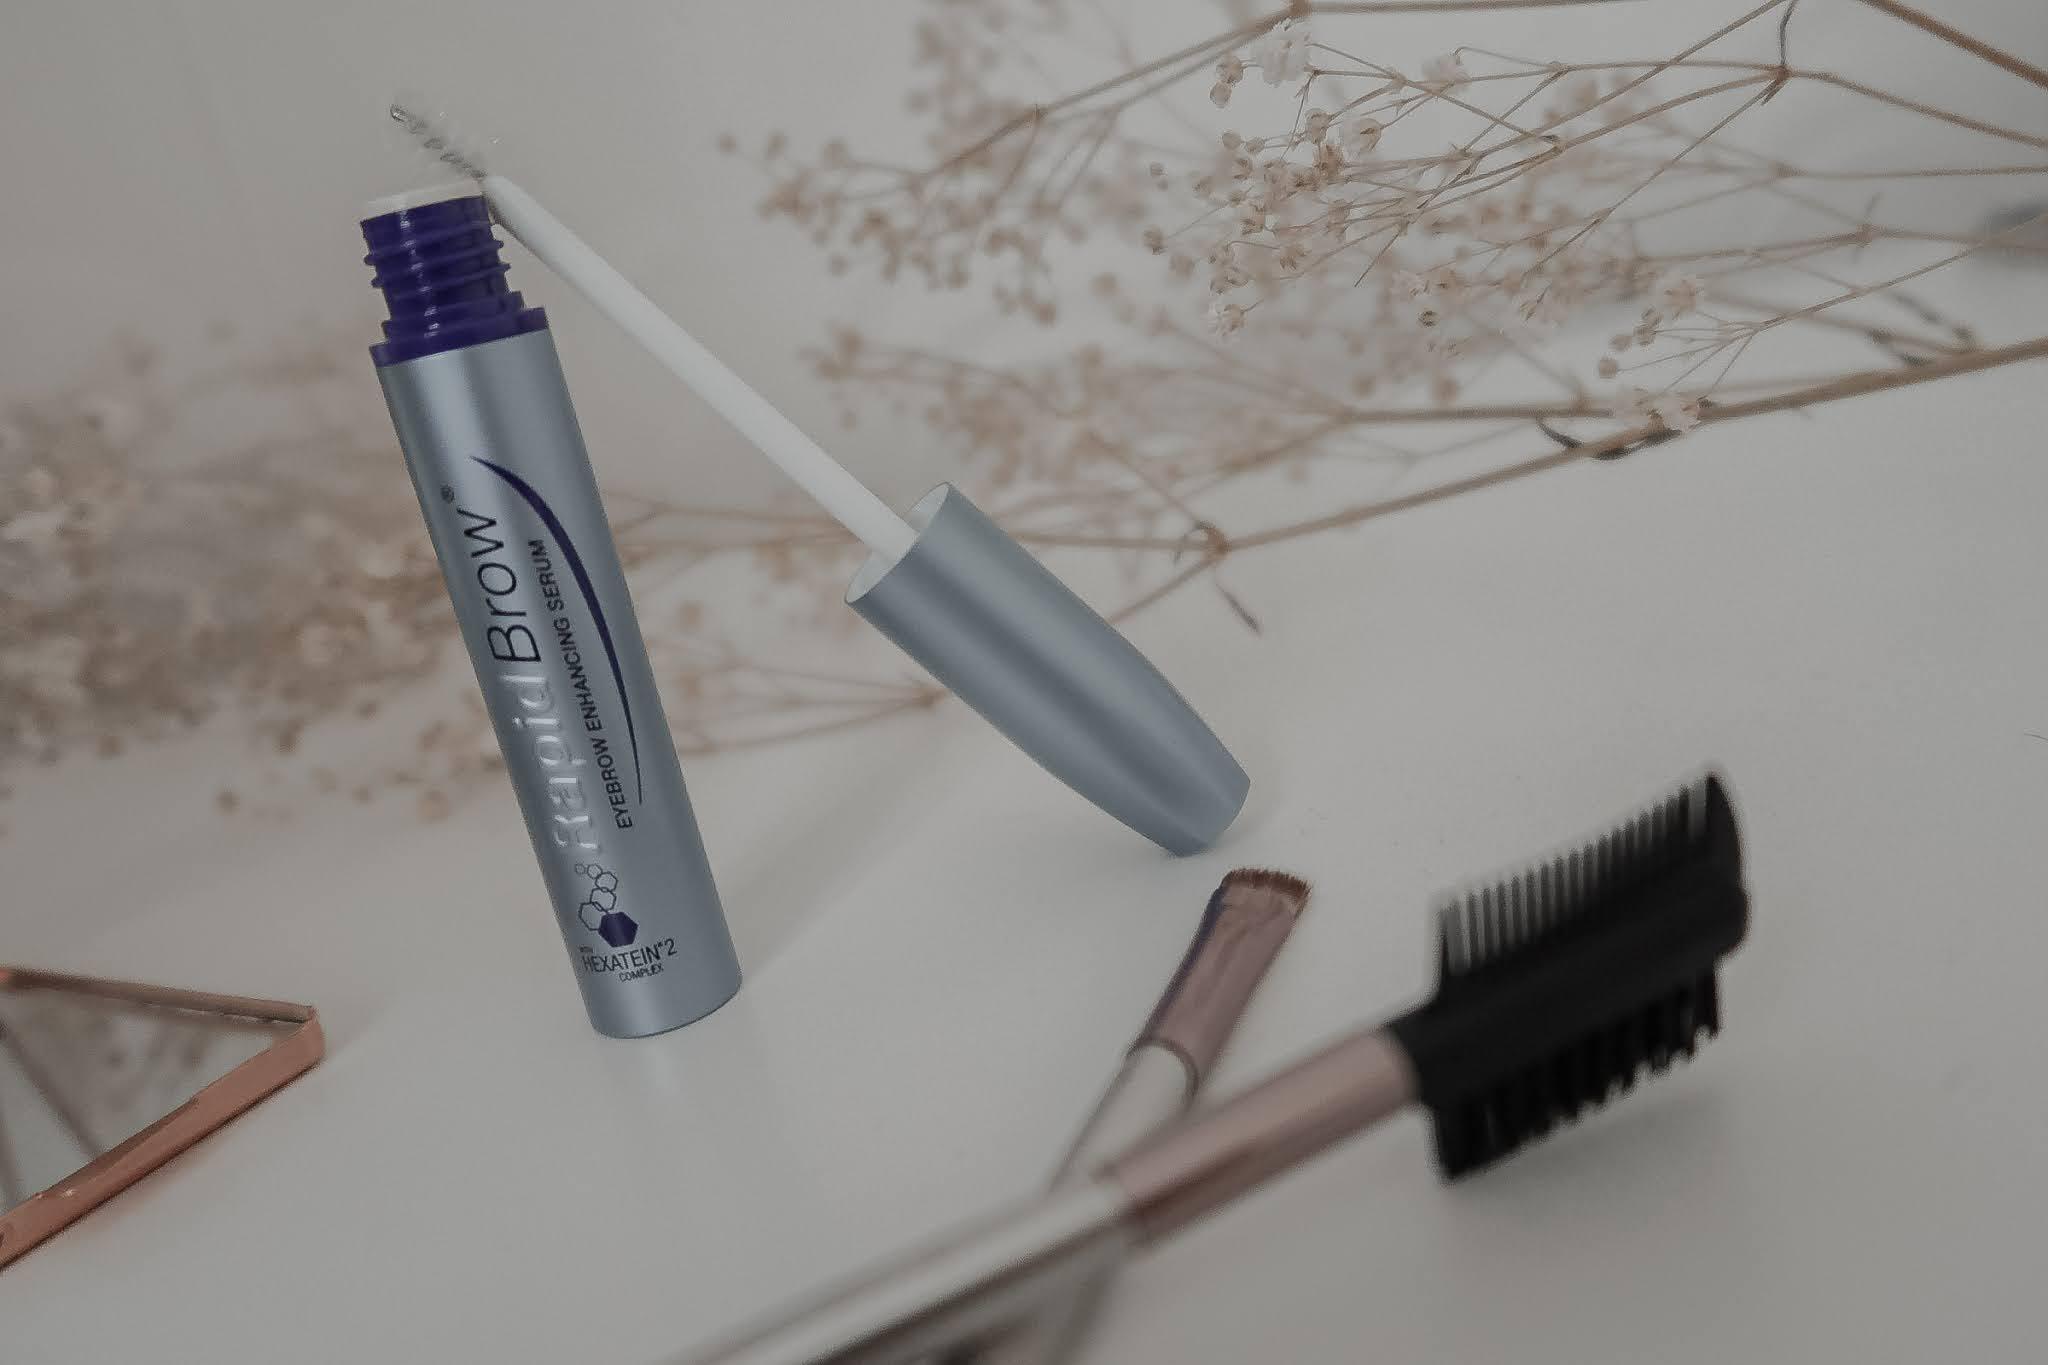 RapidBrow Eyebrow Enhancing Serum: A Review